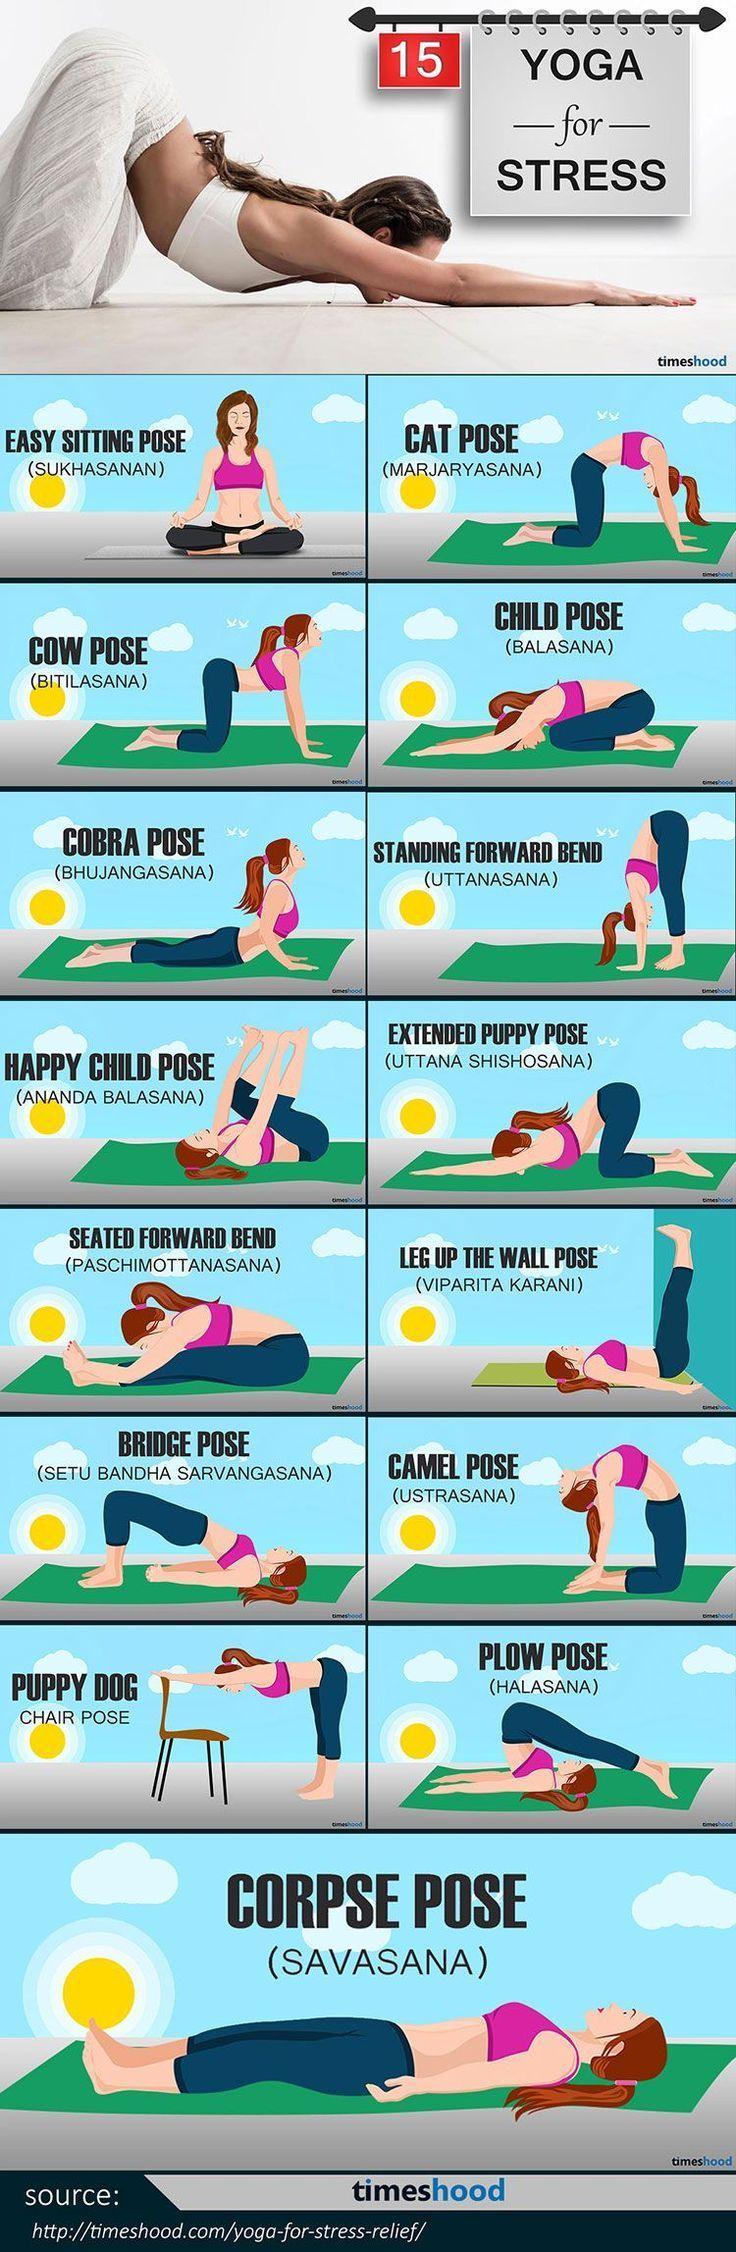 Yoga-for-Stress-Relief-info-1.jpg 750 × 2.295 Pixel Yoga für Gesundheit, Yoga für #pilatesyoga